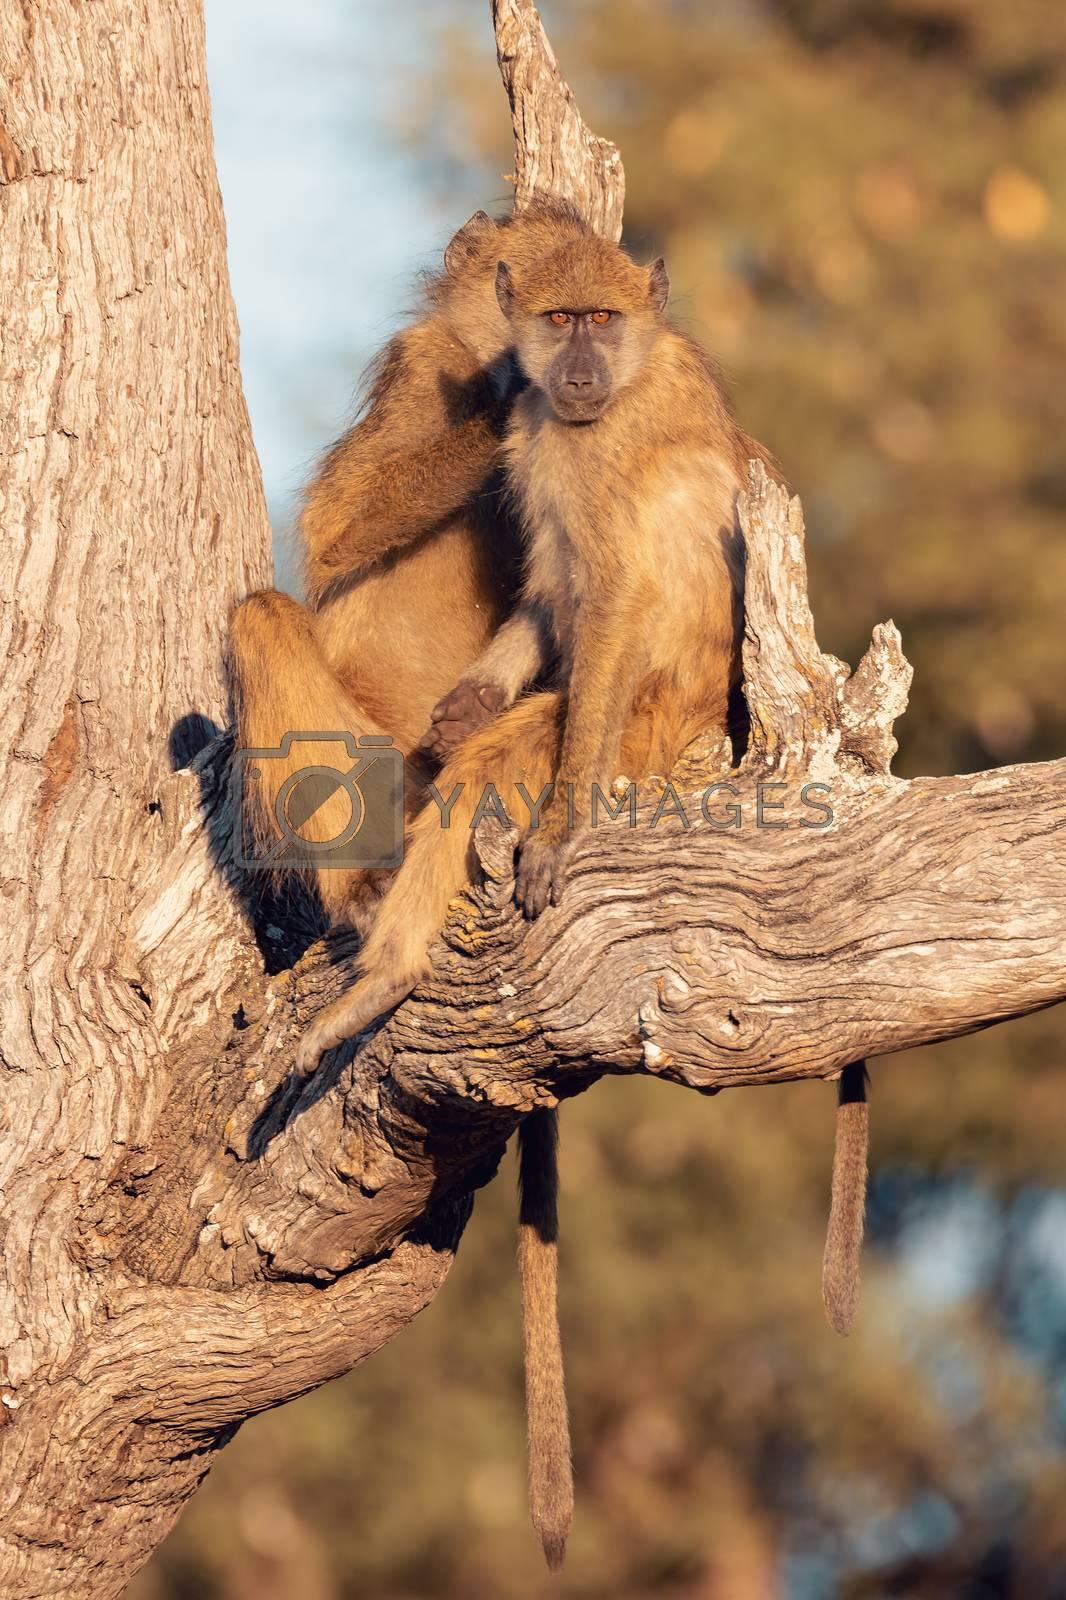 Chacma Baboon monkey (Papio anubis) on tree, Bwabwata Caprivi strip game park, Namibia, Africa safari wildlife